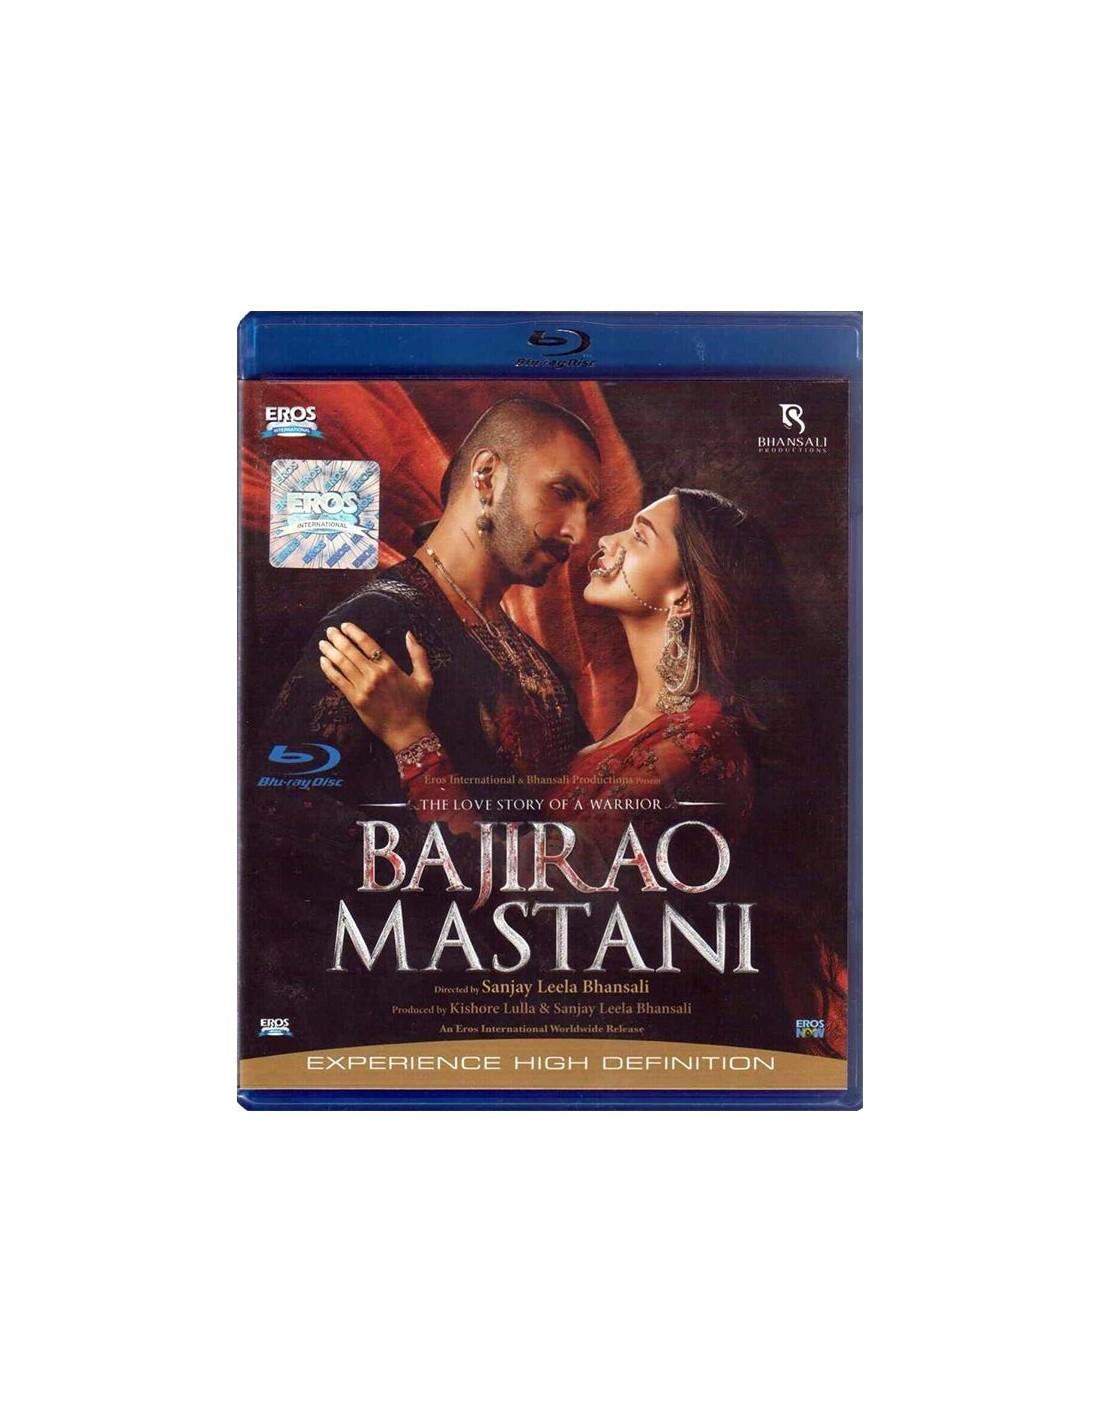 ... trailer, Bajirao Mastani gajanana, bajirao mastani release date